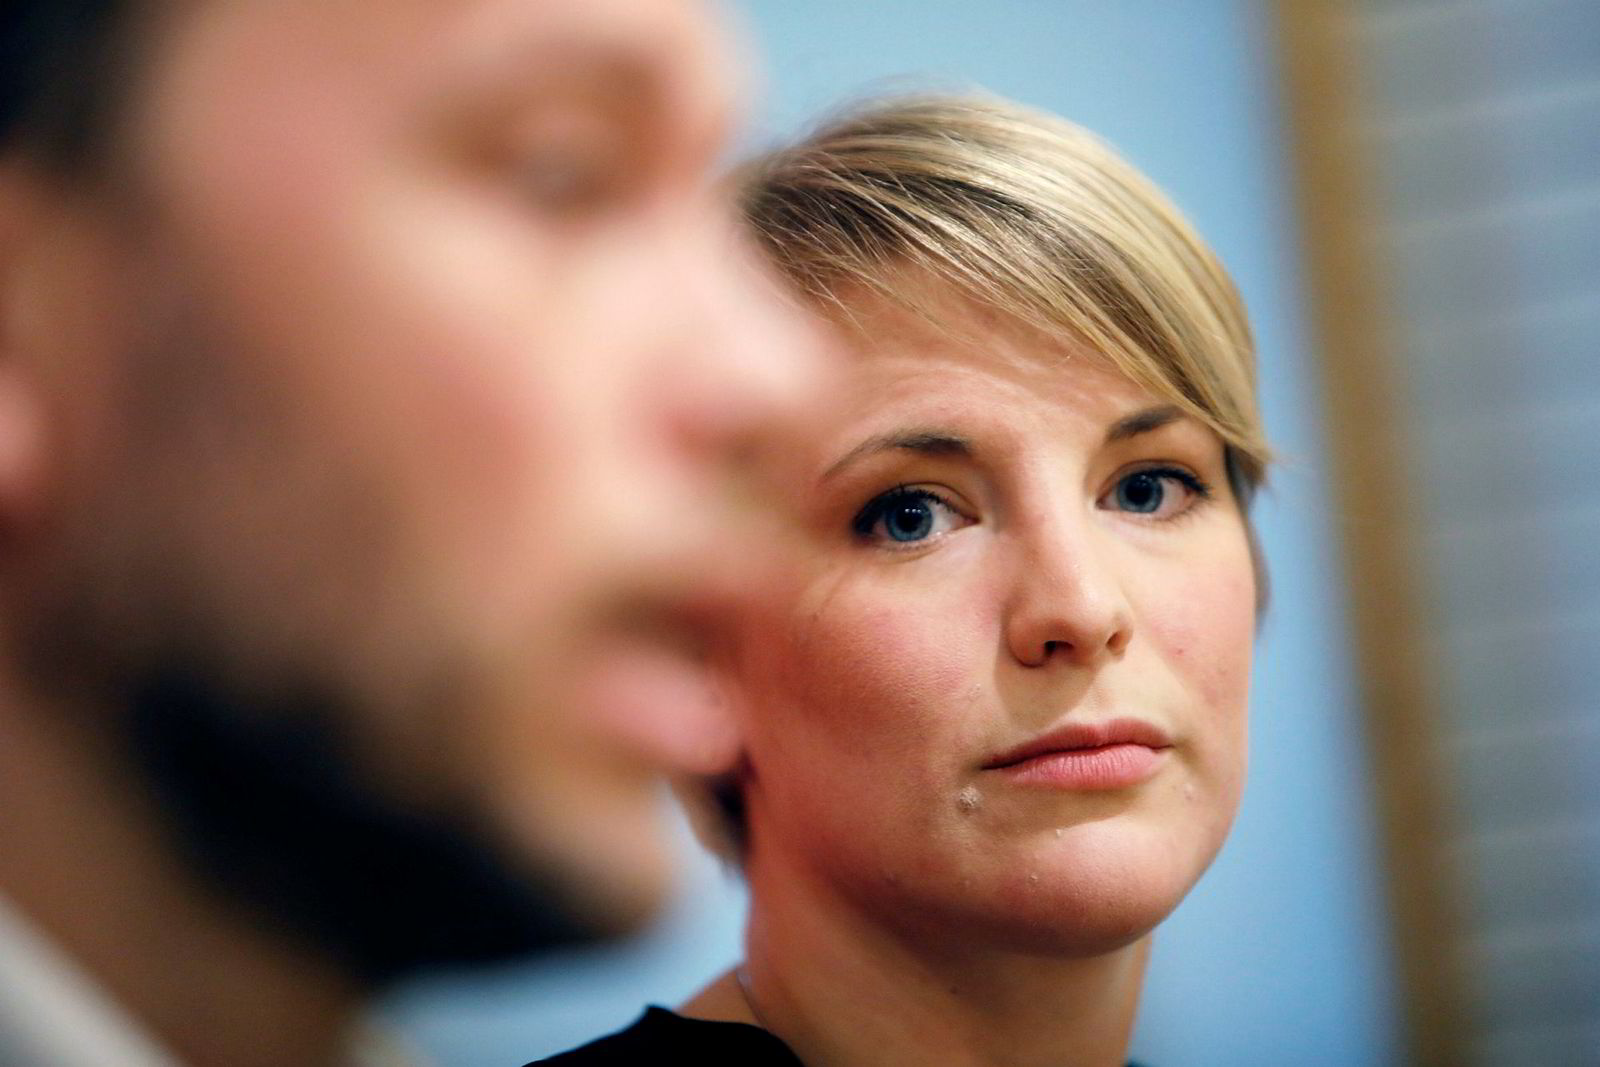 SVs finanspolitiske talskvinne, Kari Elisabeth Kaski, vil gjerne at fondet skal investere i unotert infrastruktur, og ikke begrense det til fornybar energi.